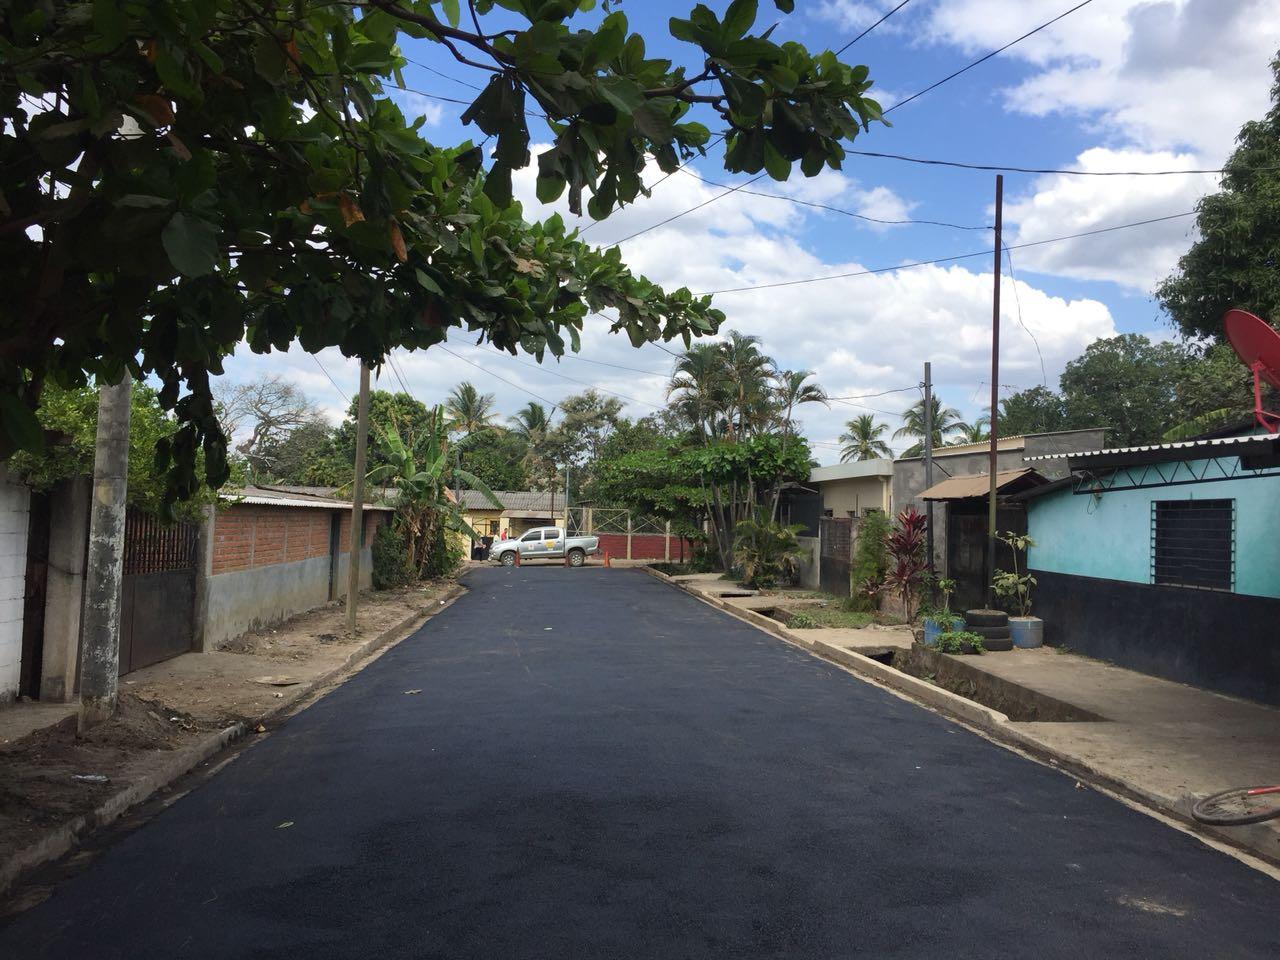 MOP pavimenta calles de cantón  Sitio del Niño, San Juan Opico, La Libertad